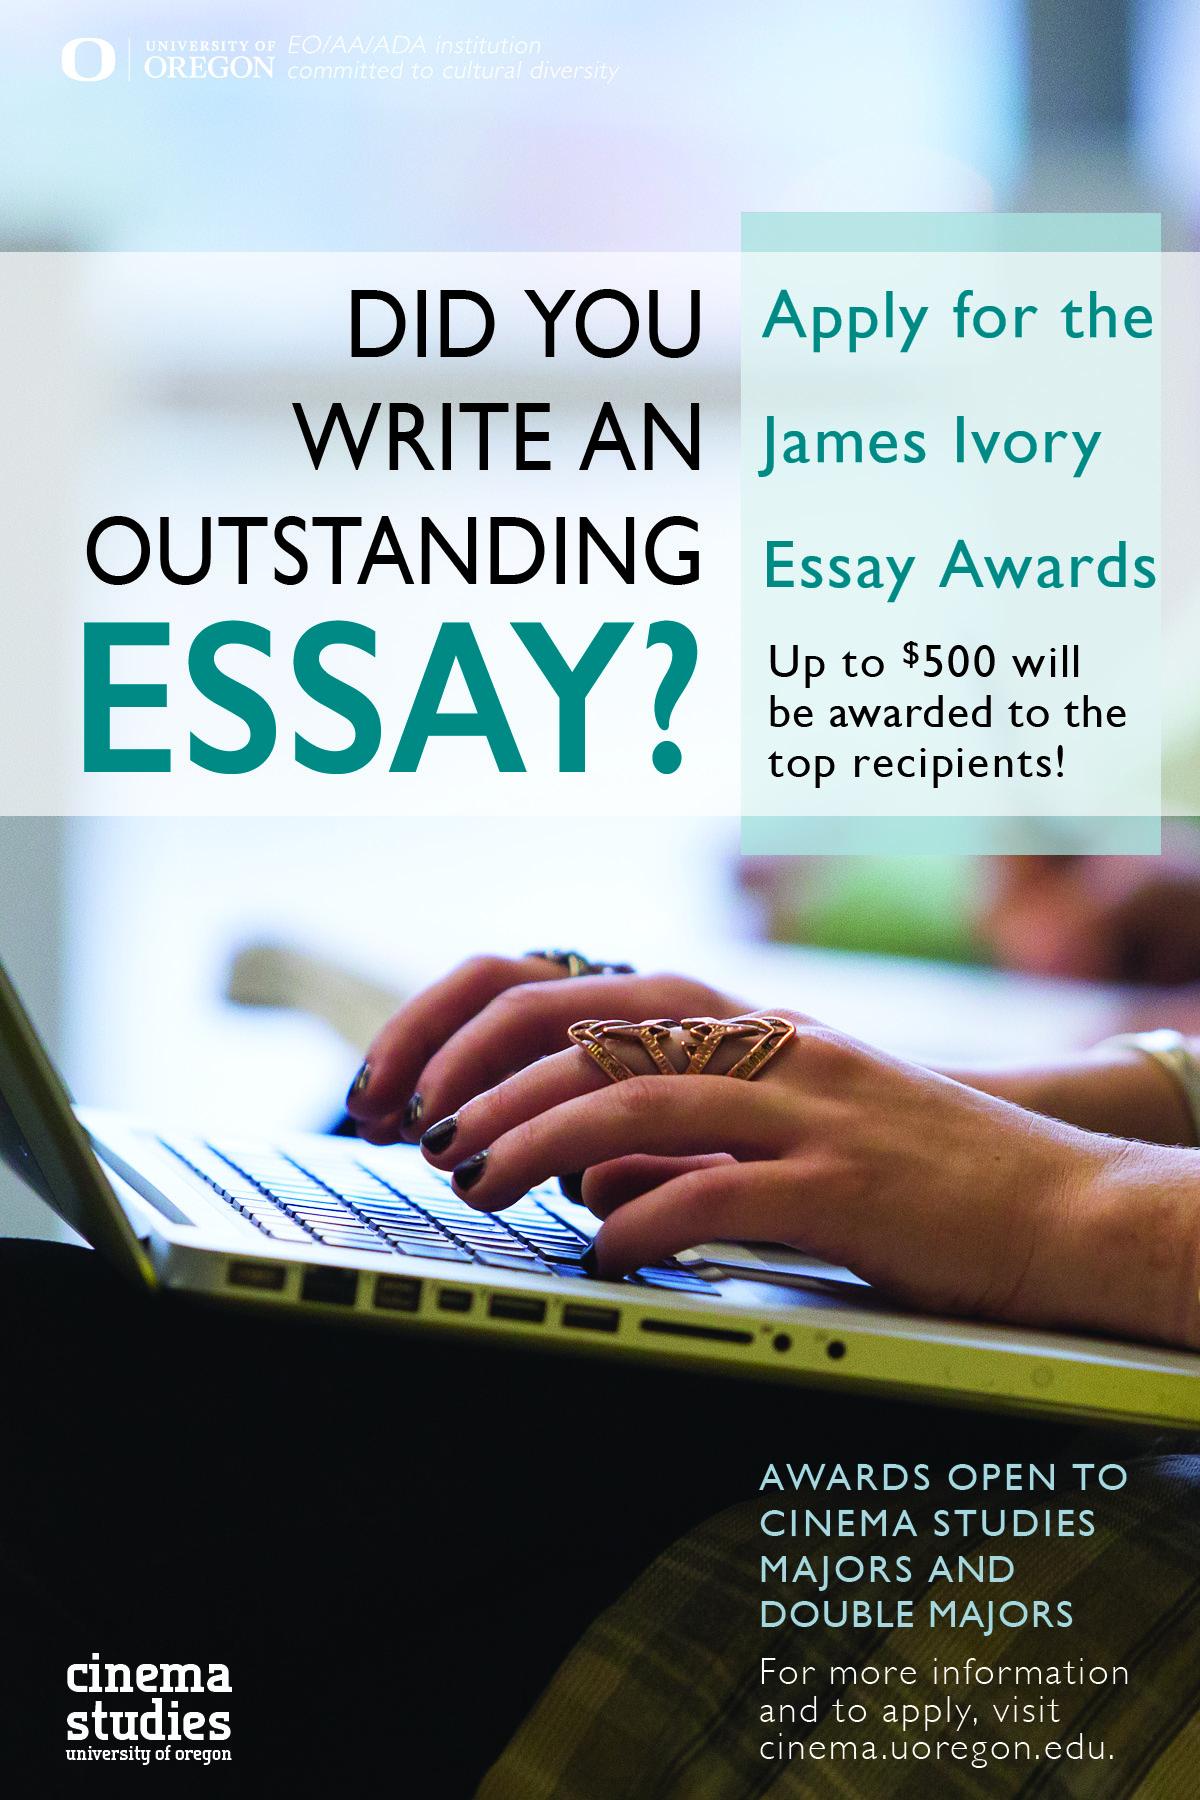 James Ivory Essay Awards